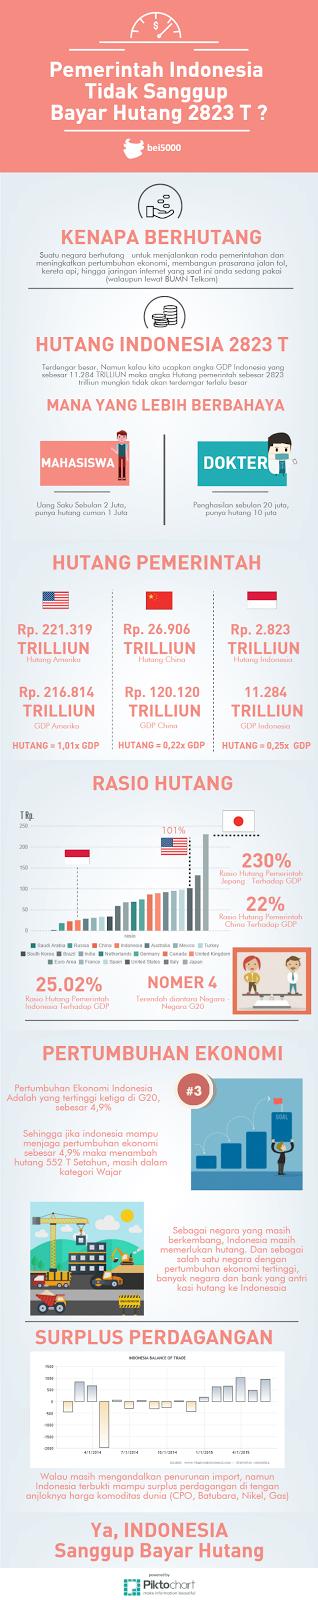 Sanggupkah Indonesia Bayar Utang? - Saham Syariah Indonesia